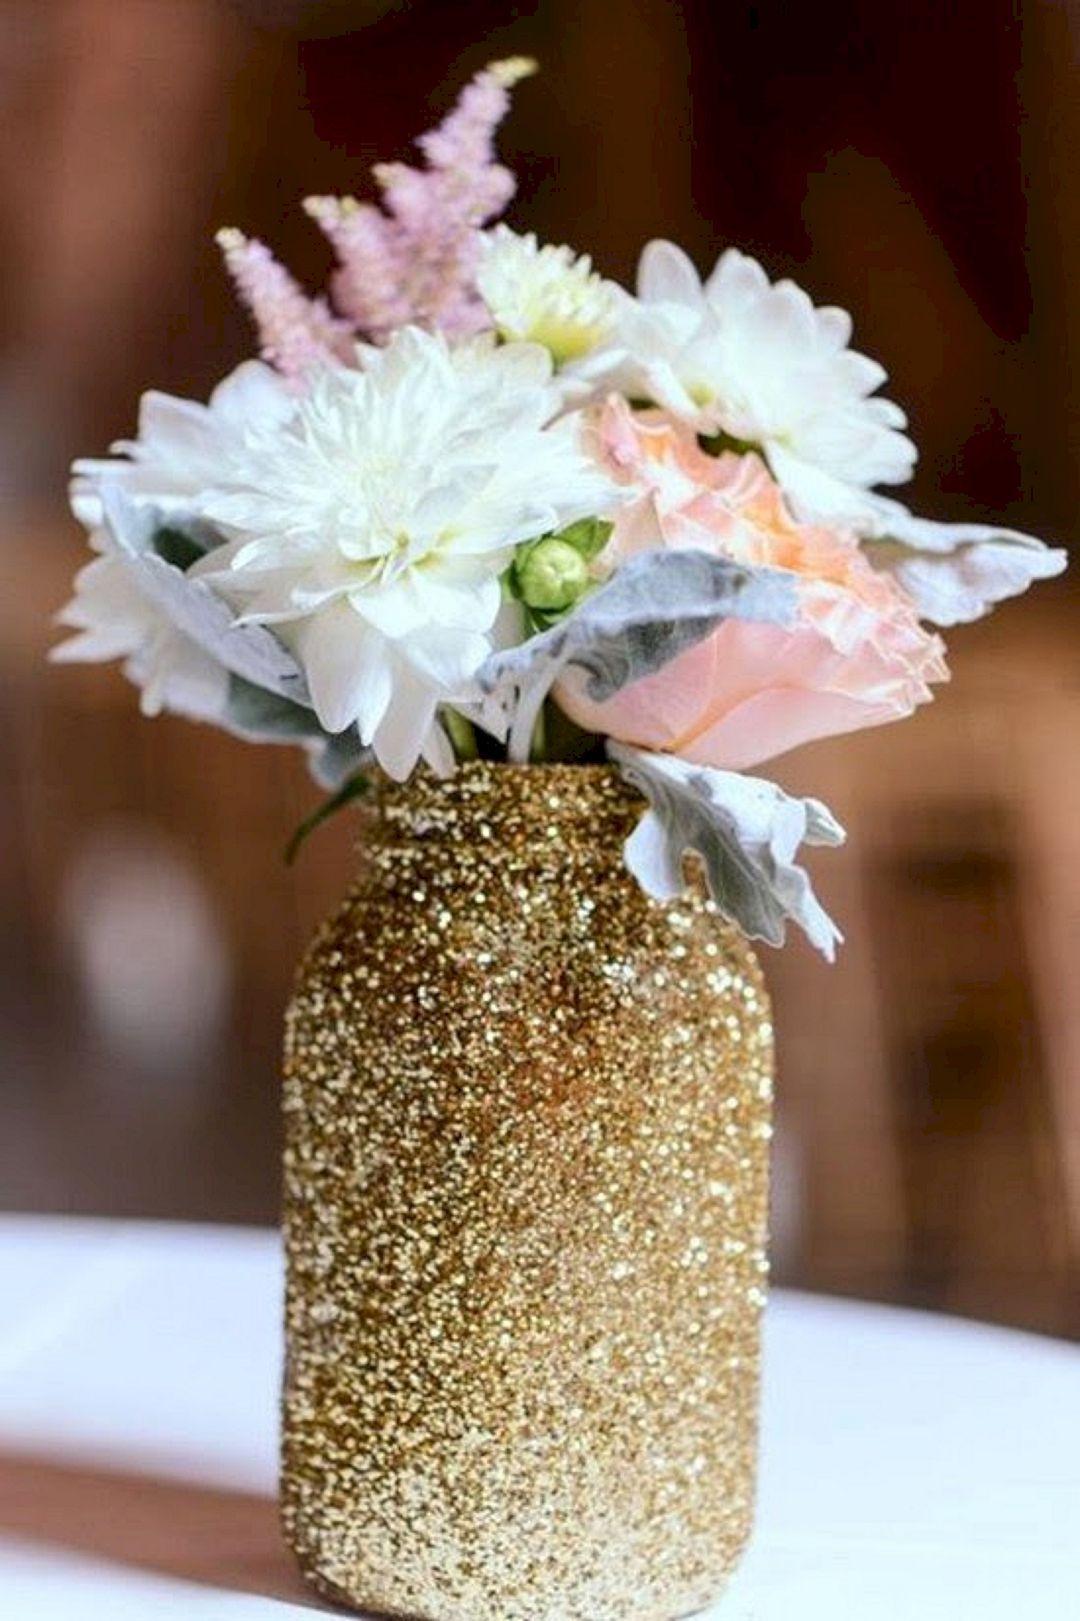 wedding centerpieces fake flowers%0A    DIY Creative Rustic Chic Wedding Centerpieces Ideas